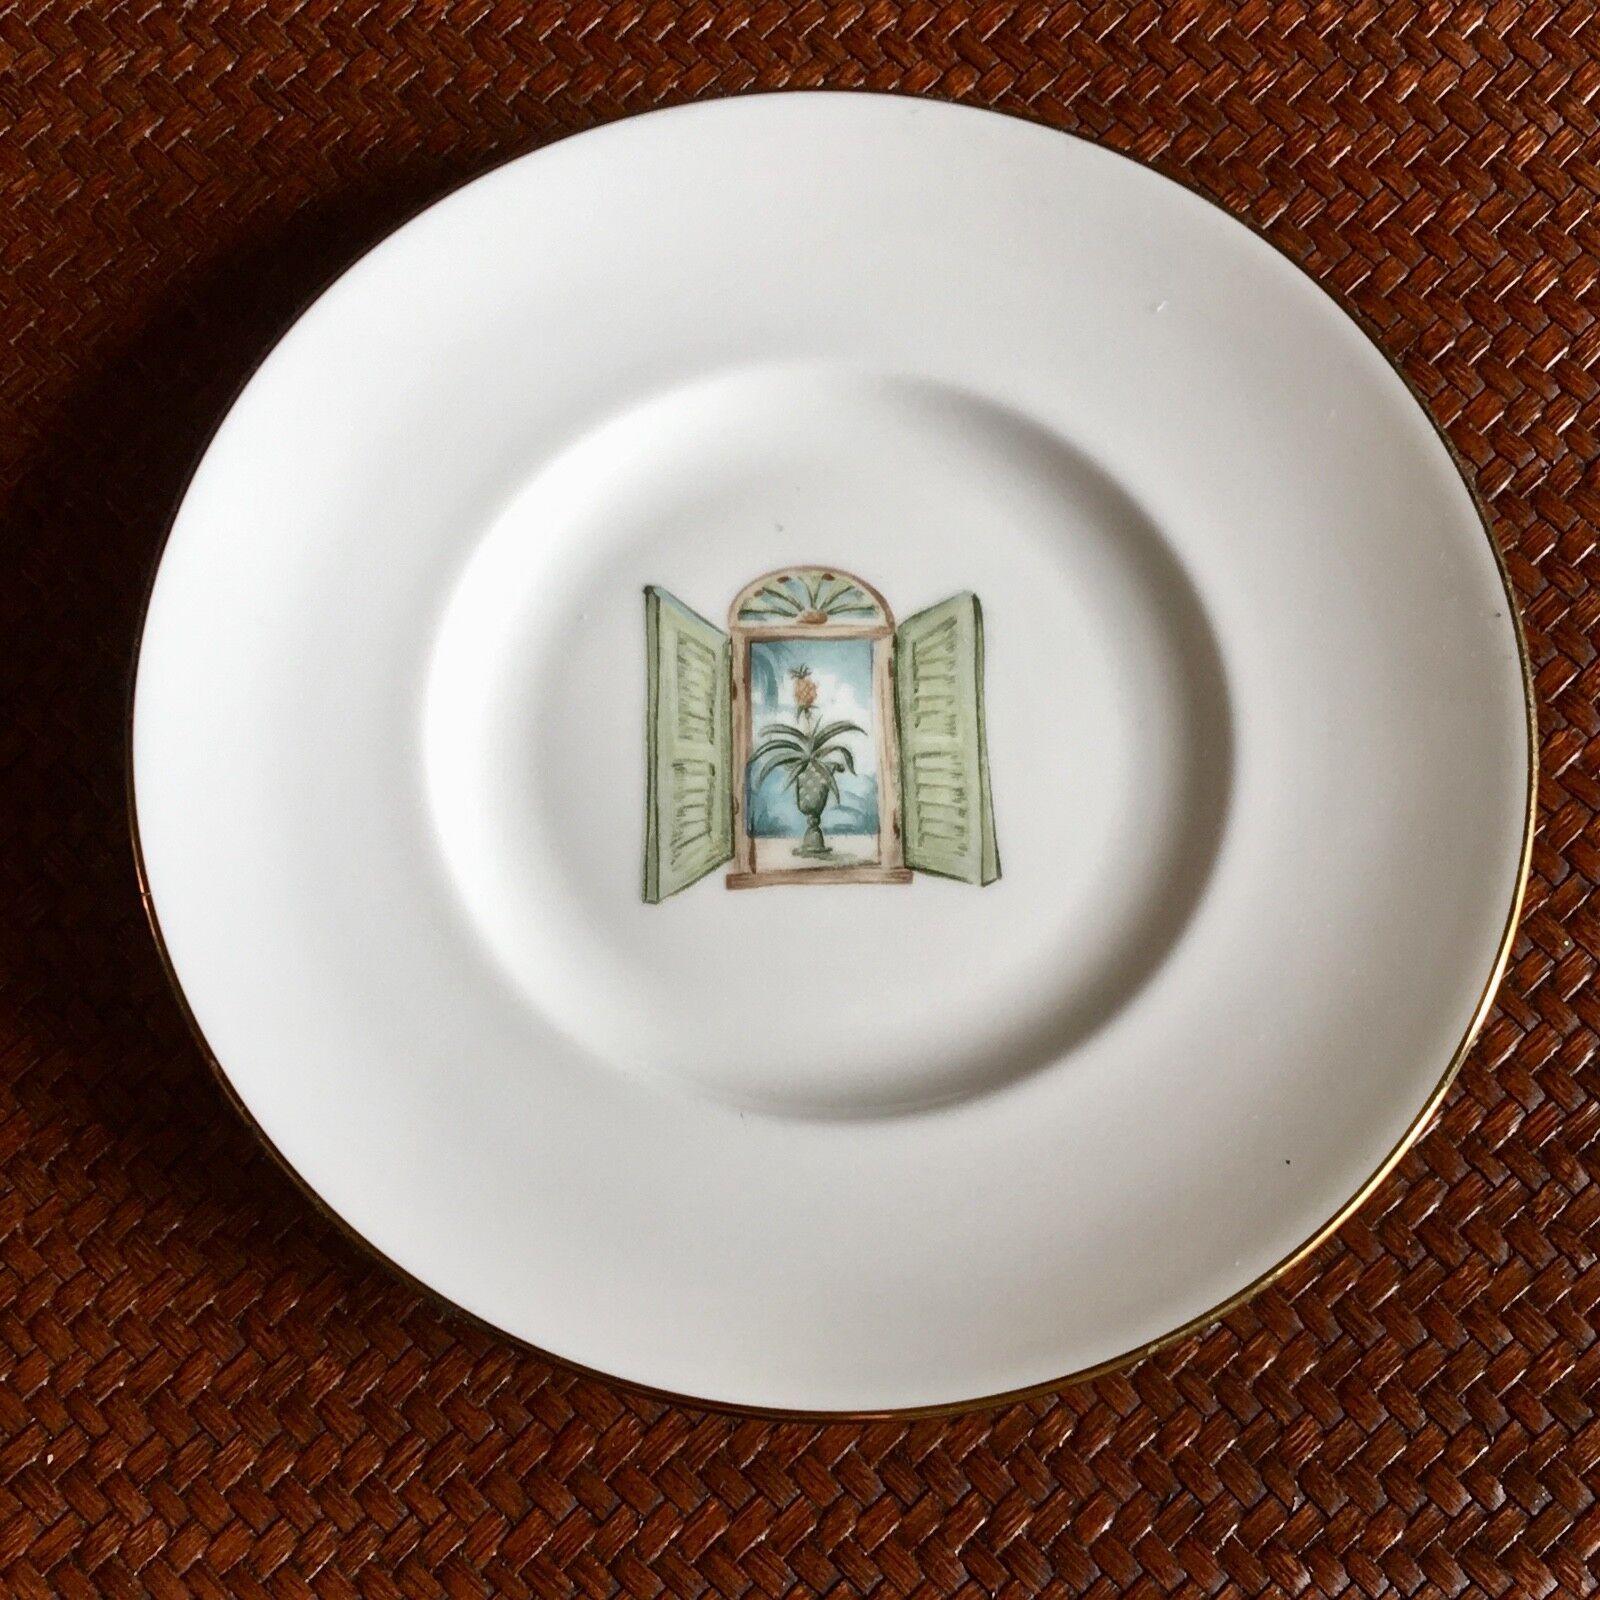 Купить Lenox British Colonial Collection - Unused Lenox British Colonial Collection Shutter 7.25 Salad Dessert Bread Plate